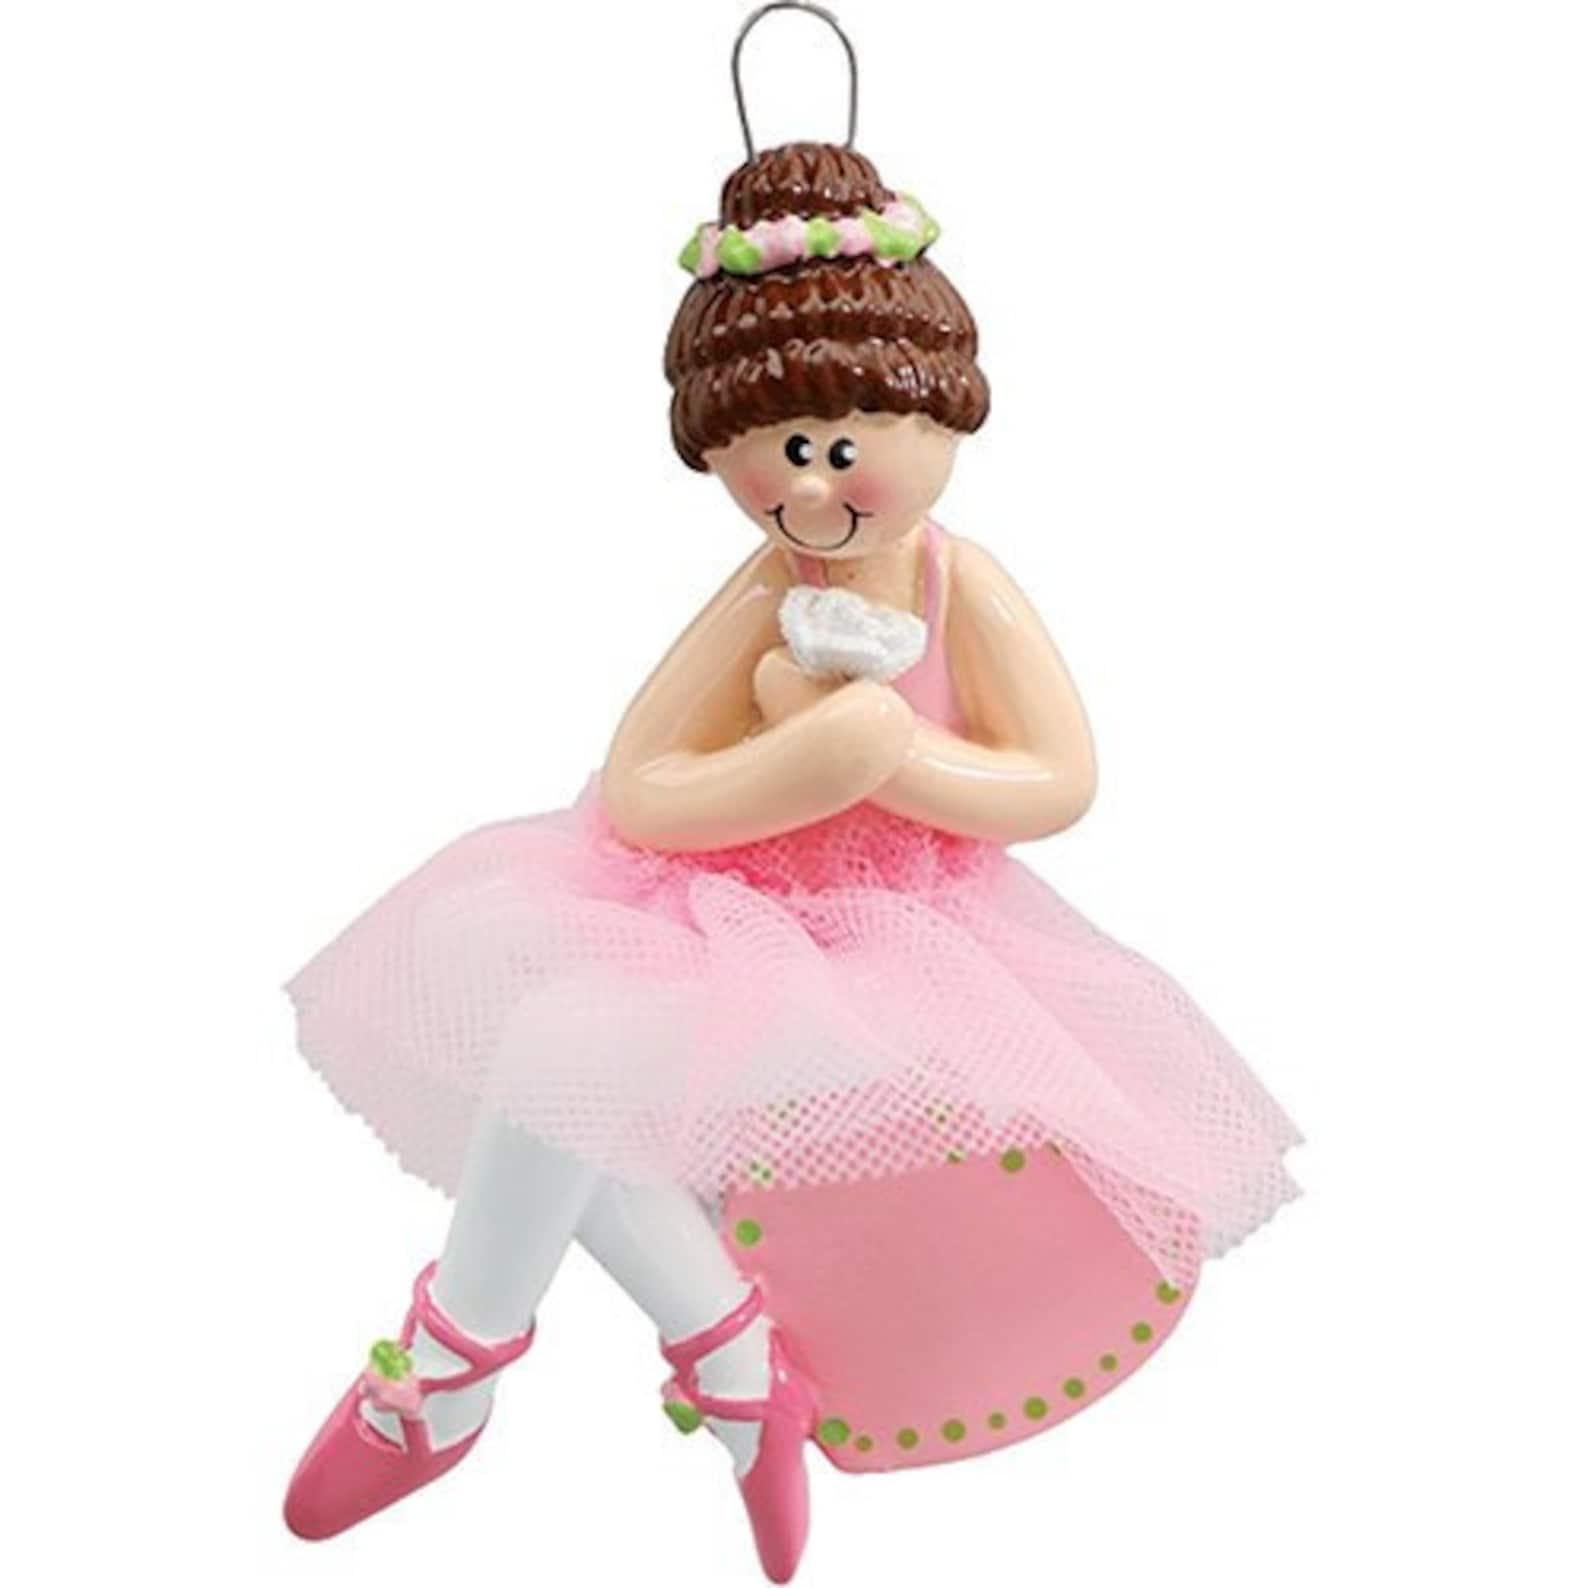 personalized christmas ornaments 2018 ballerina pink ballet dress shoe dance dancer ballerina sports active holiday - free custo